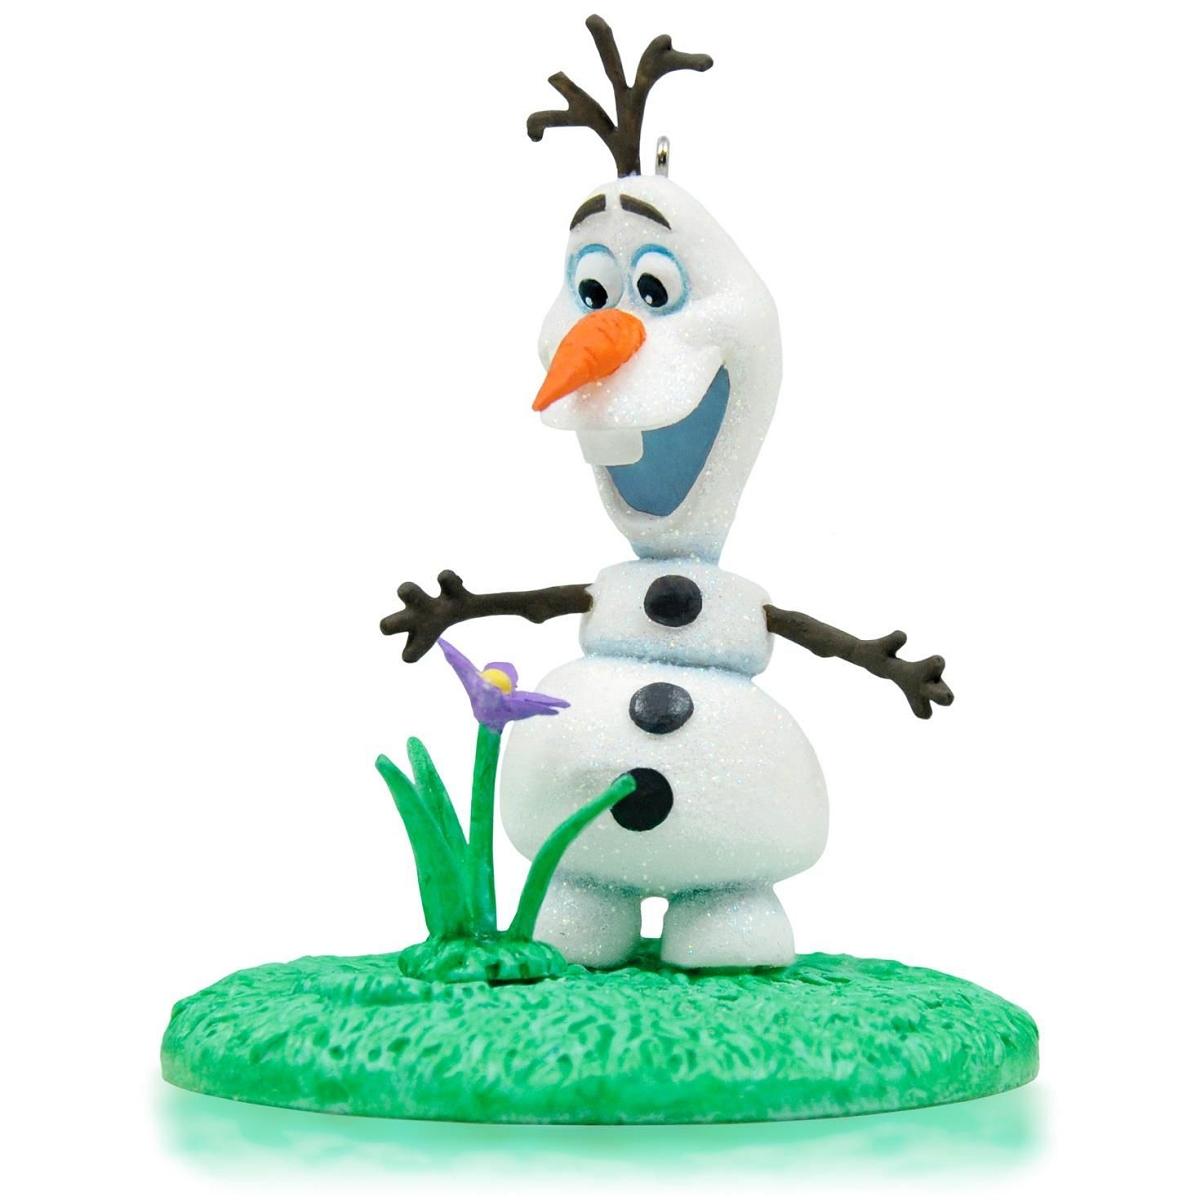 2015 Olaf In Summer, Frozen Hallmark Keepsake Ornament ...